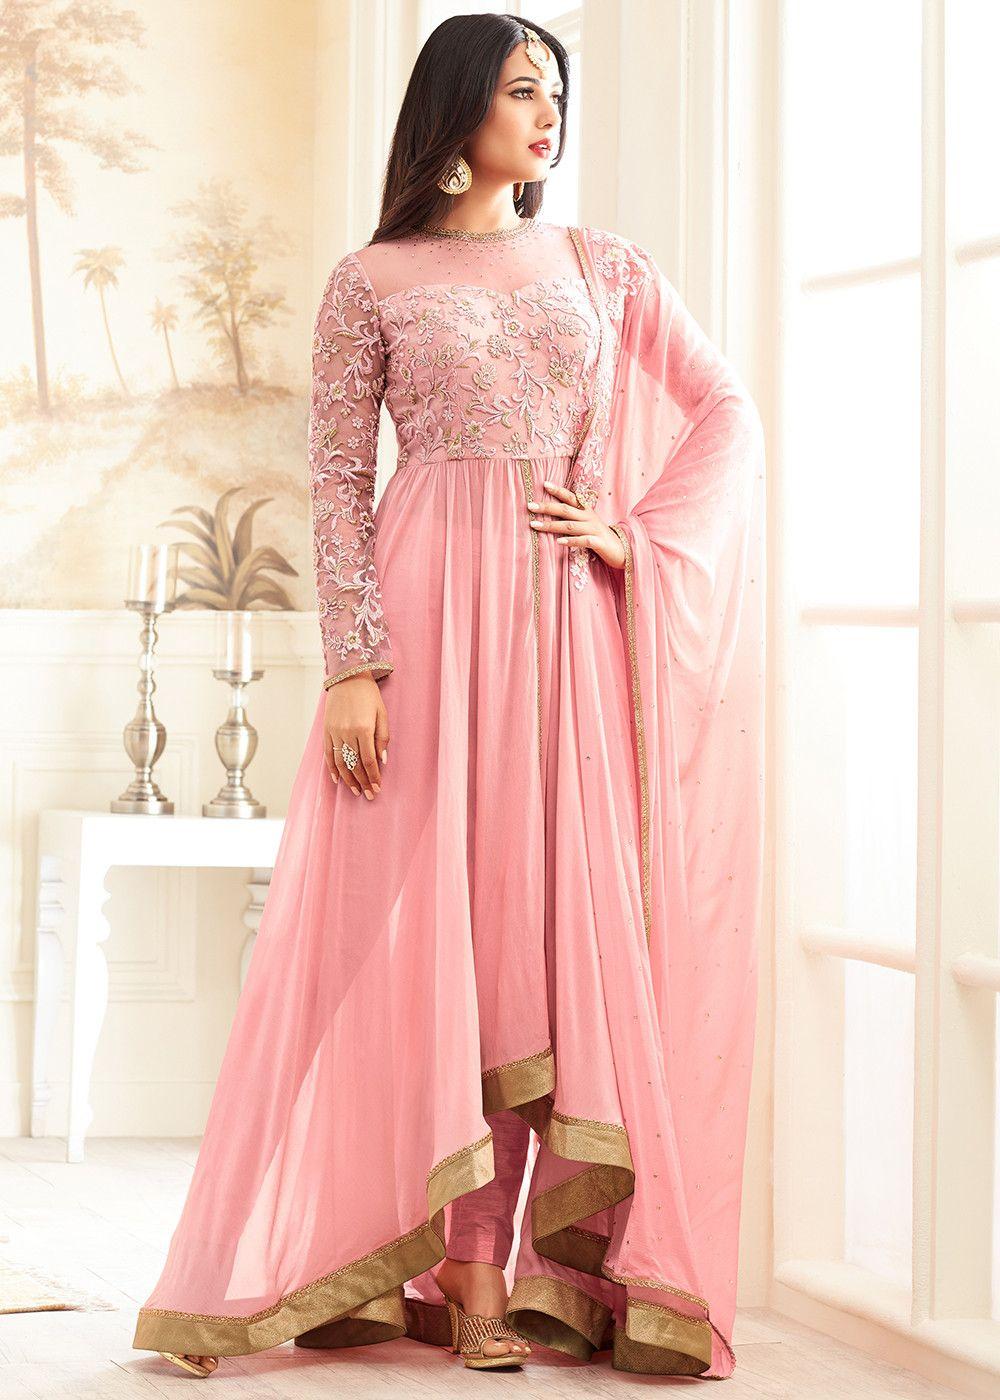 eead53c48e Sonal Chauhan Light Pink Georgette Pant Suit | Latest Salwar Kameez ...